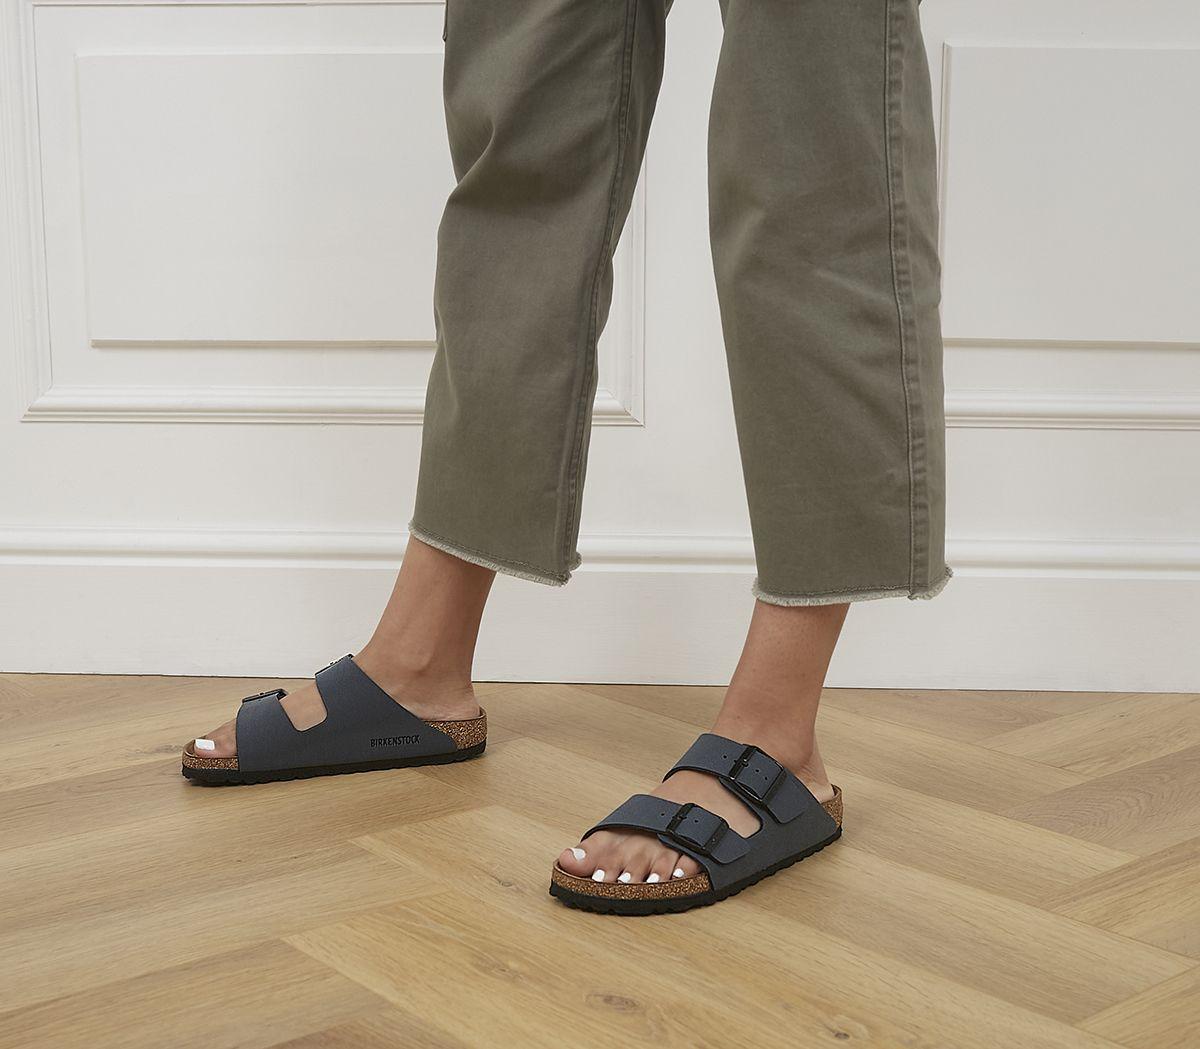 e6a4d2b5 Birkenstock Arizona Two Strap Basalt Nubuck - Sandals